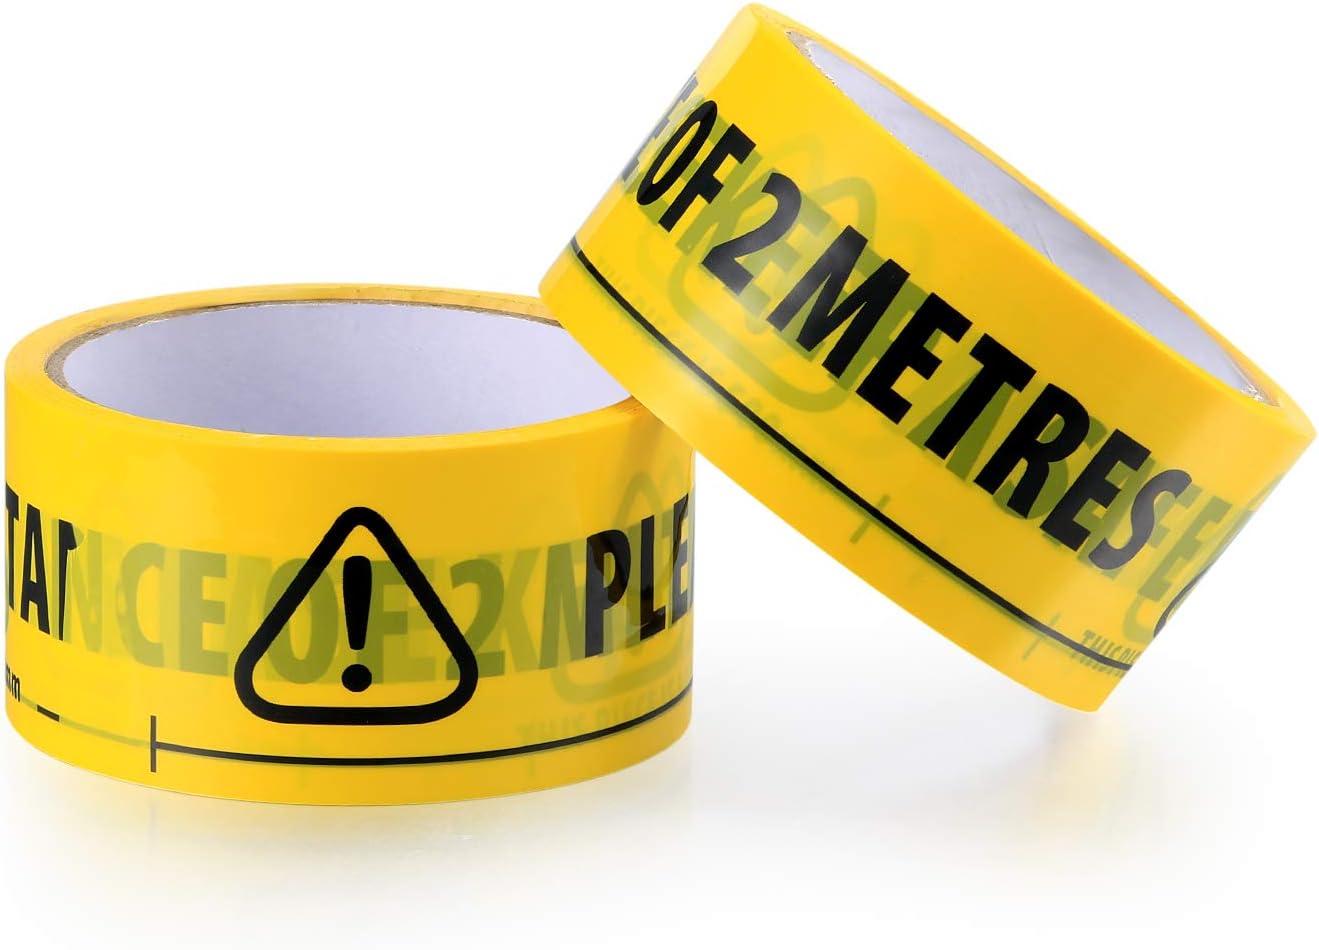 Yellow Adhesive Barricade Tape for Shops Warehouses Danger Areas 2Pcs Safety Tape Yellow Black 33m x 48mm Hazard Warning Tape Adhesive 2m Metre Apart Social Safe Distancing Floor Tape Waterproof